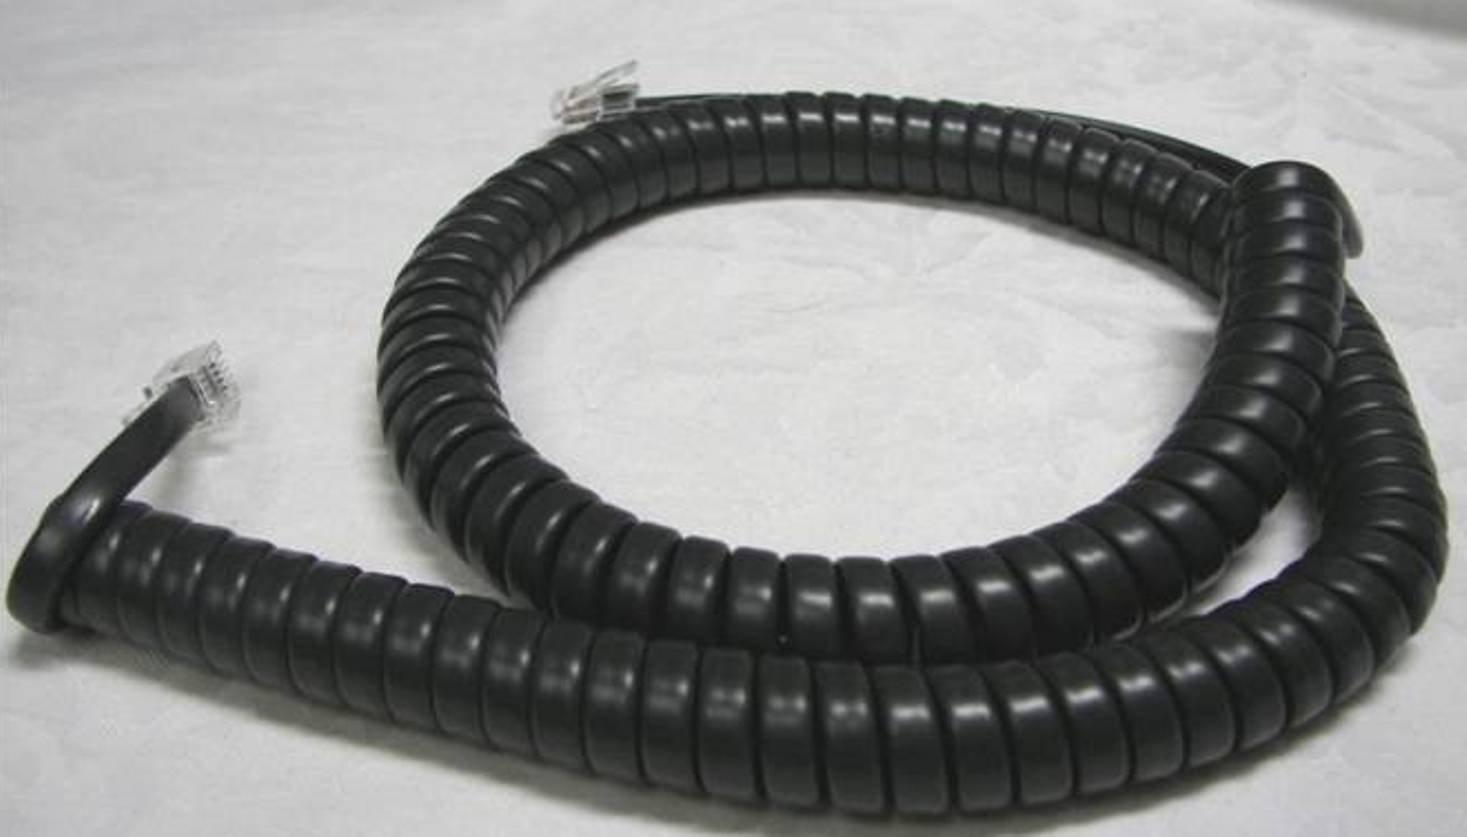 Lot of 10 Charcoal (aka Black) 12' Ft Handset Cords for Avaya 9600 IP Series Phone 9601 9608 9608G 9610 9610G 9611 9611G 9620 9620L 9621 9630 9640 9641GS 9650 9650C 9670 9641GS 9670G by DIY-BizPhones